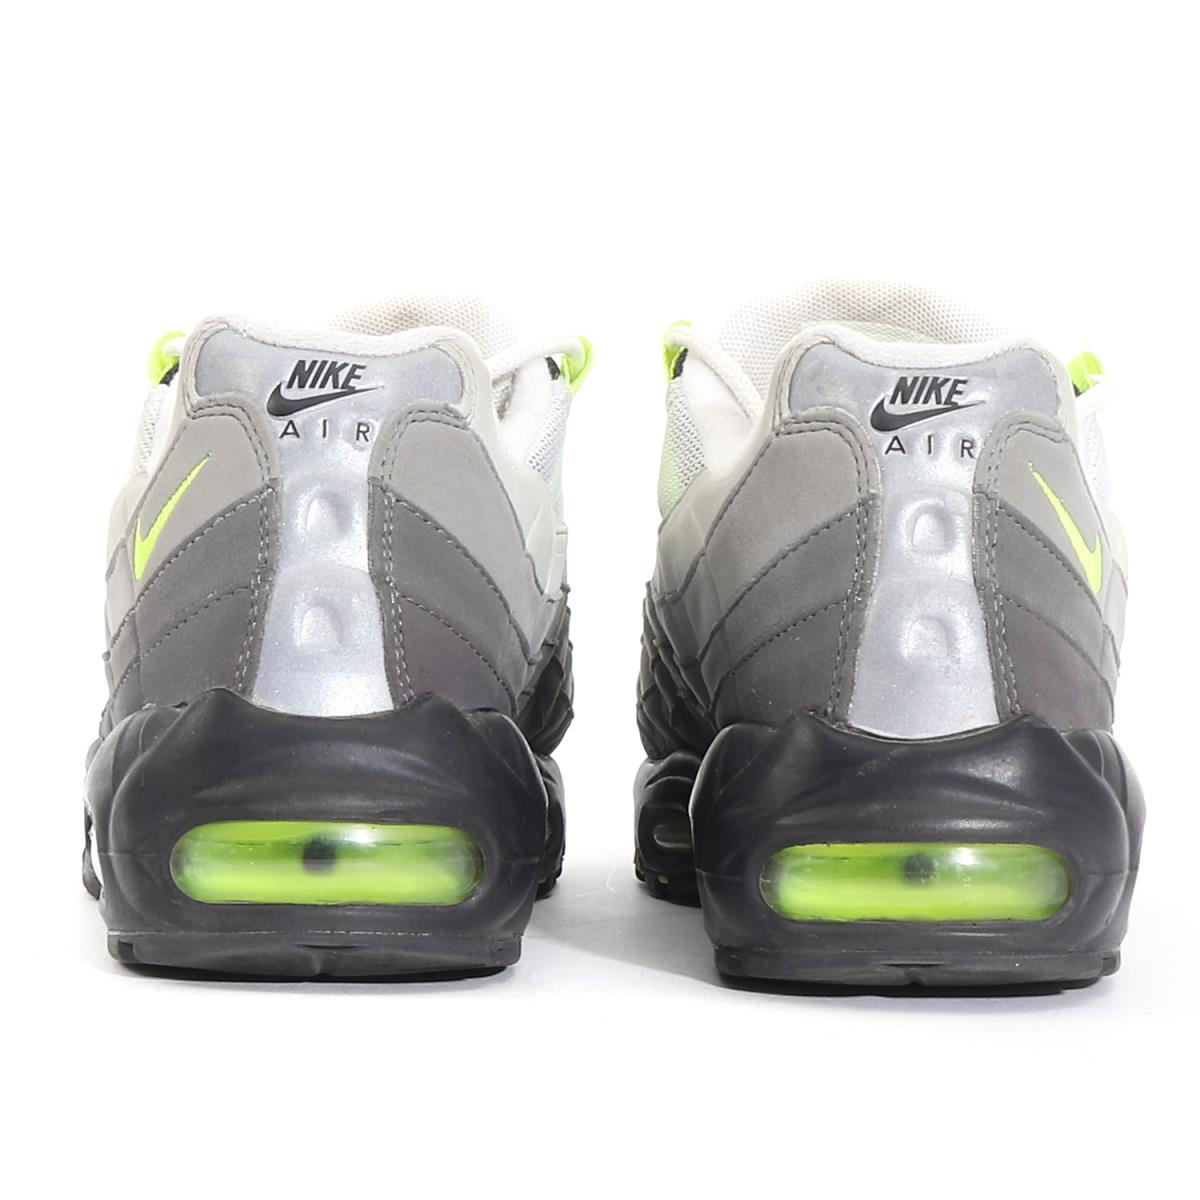 NIKE (Nike) AIR MAX 95 OG VOLT NEON ( 554,970 071 made in 2015) black X bolt US8.5(26.5cm)